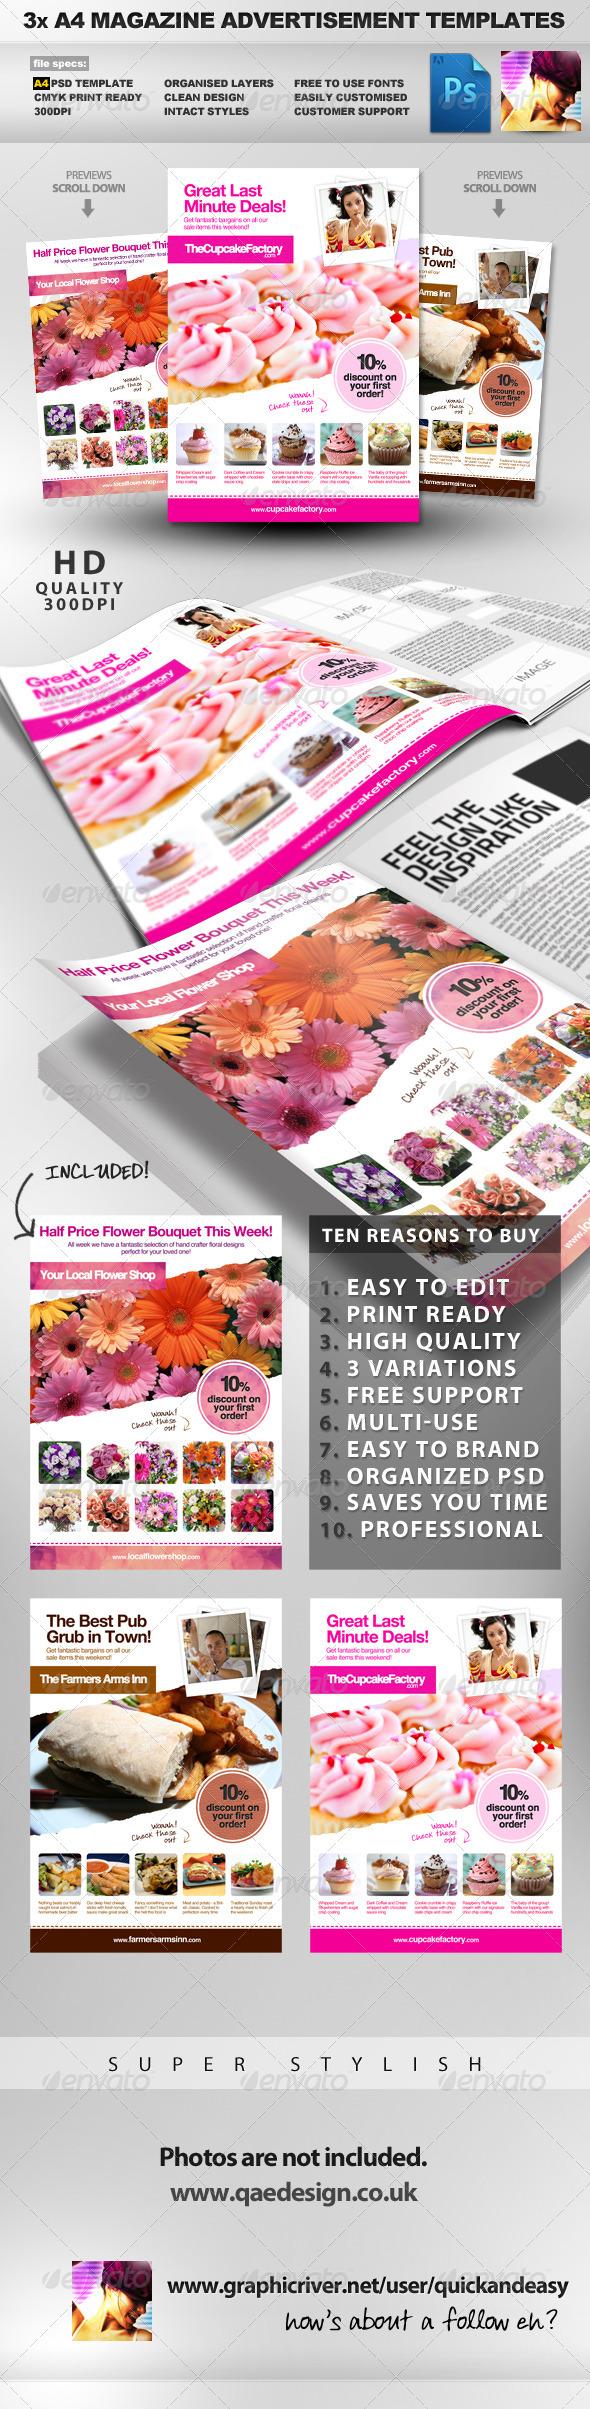 GraphicRiver 3x A4 PSD Magazine Advert Templates 609016